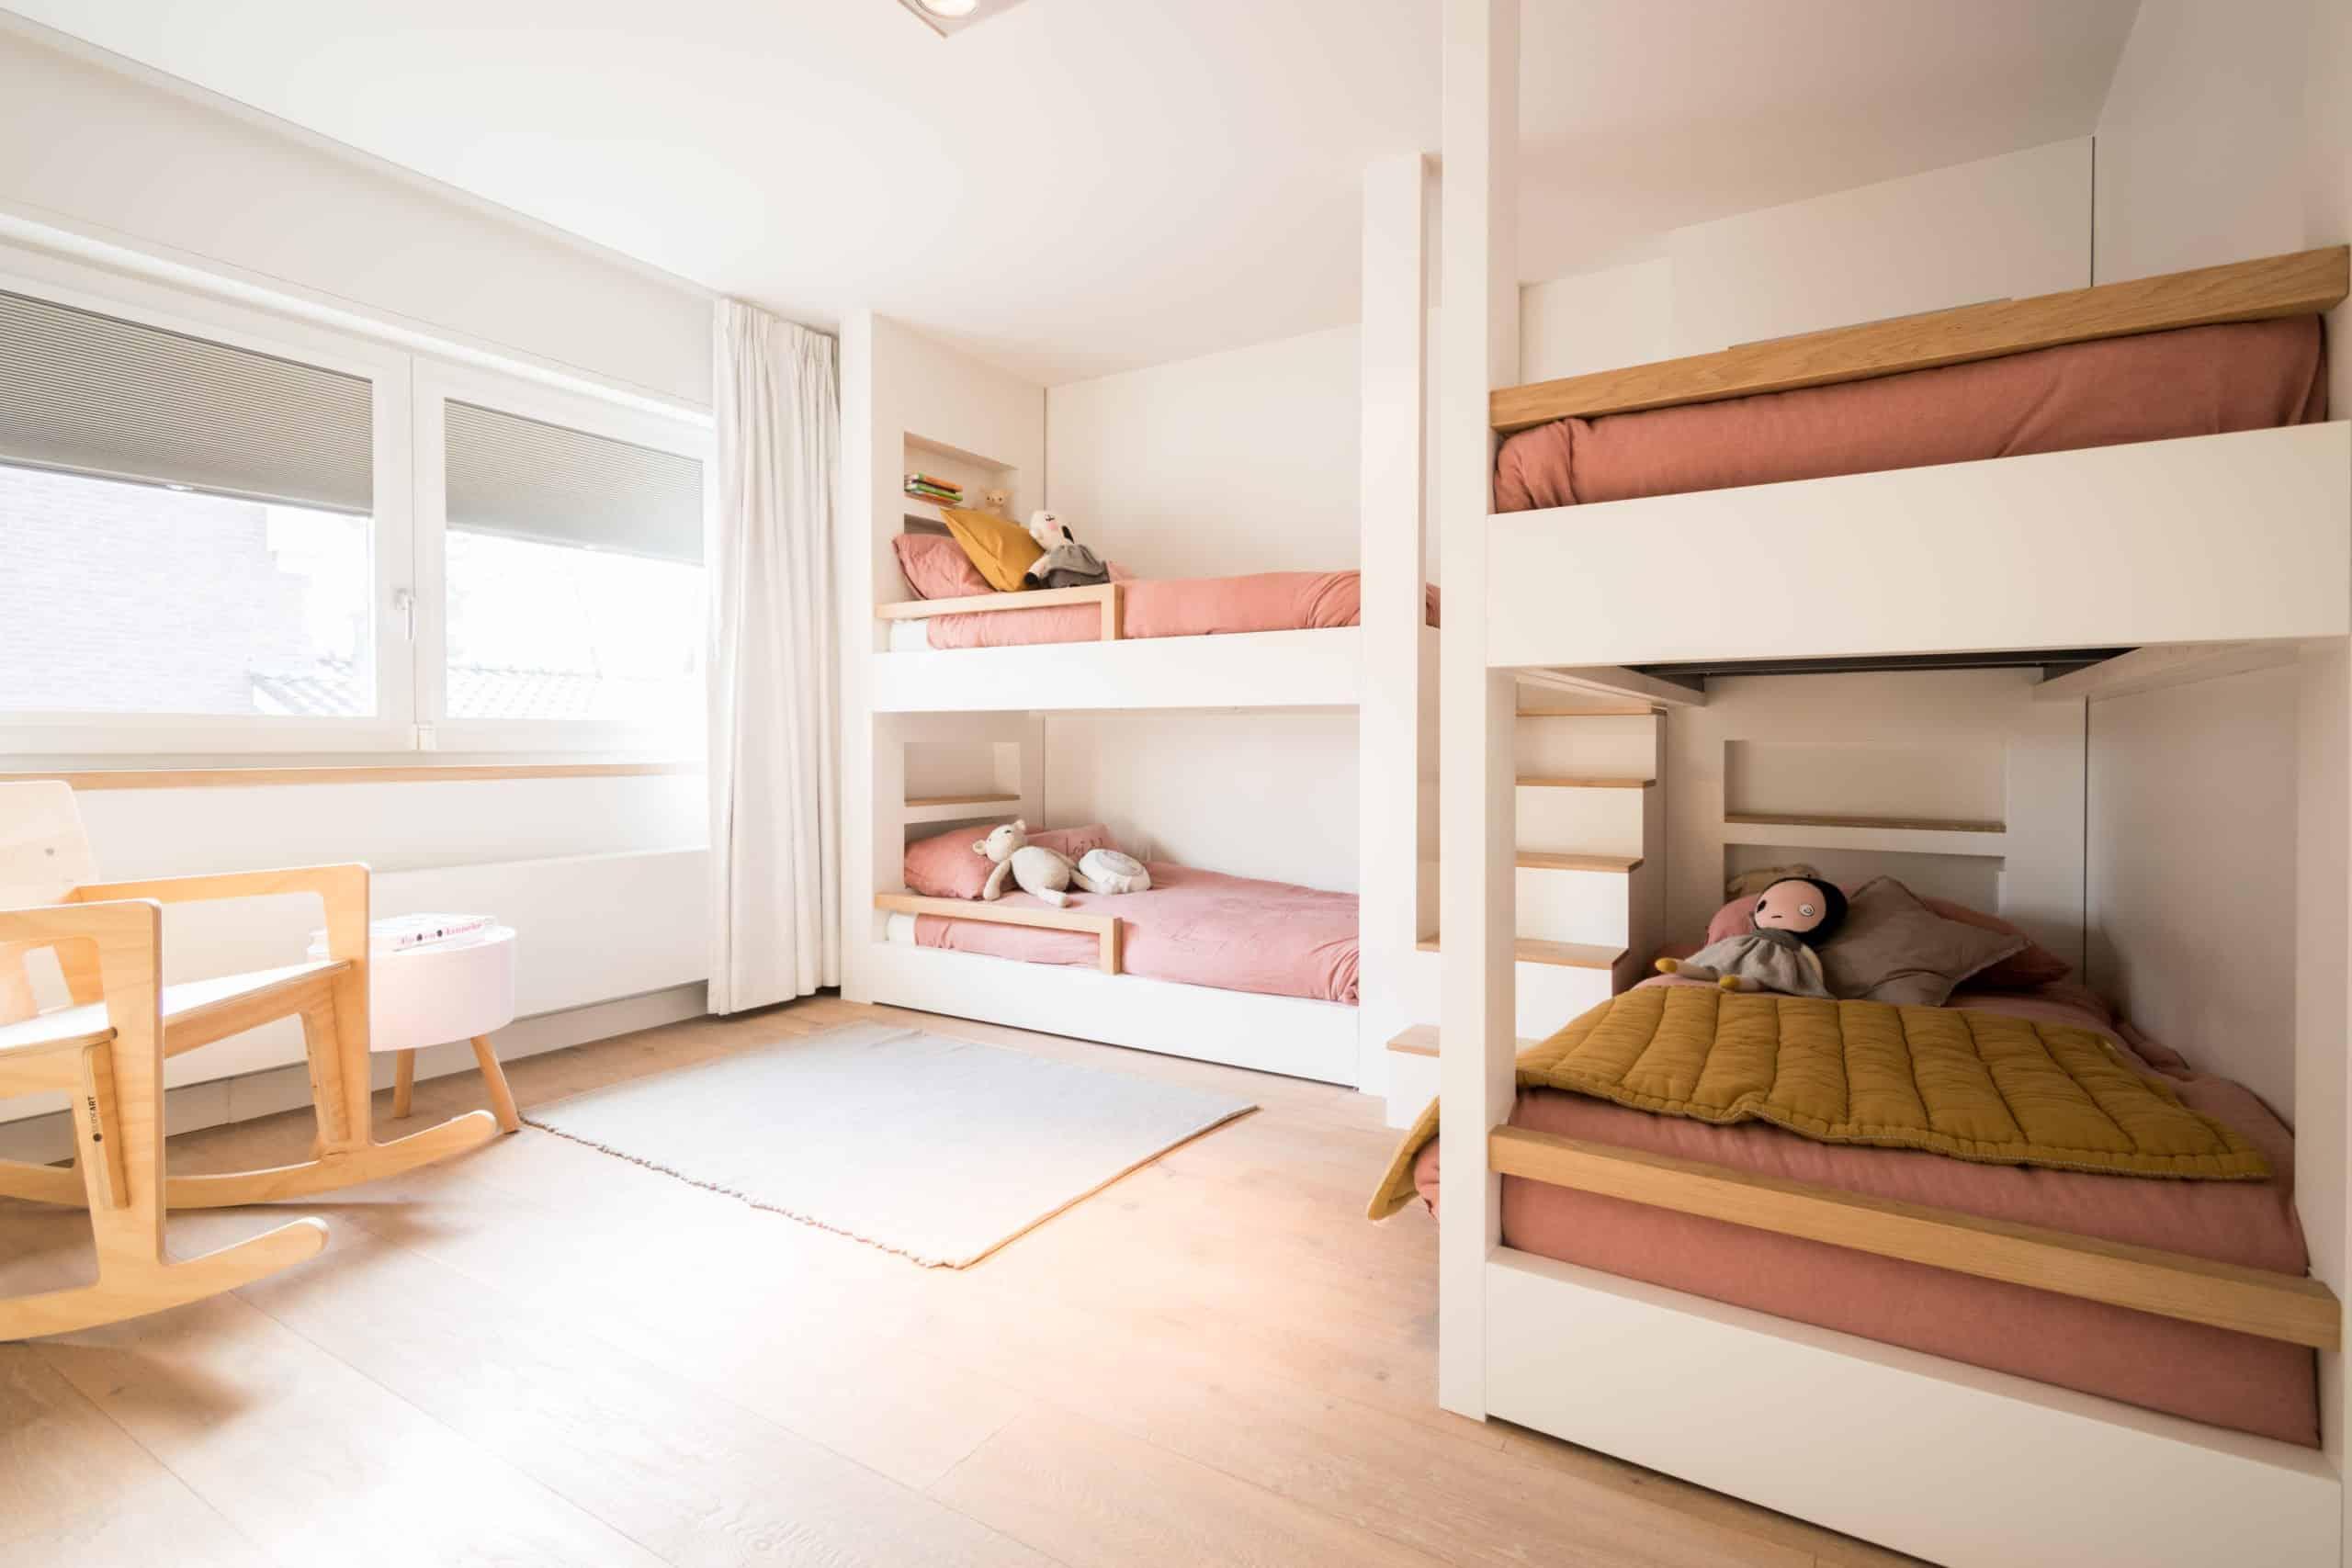 Hout en Vorm - Woning 3 - Kinderslaapkamer - 1